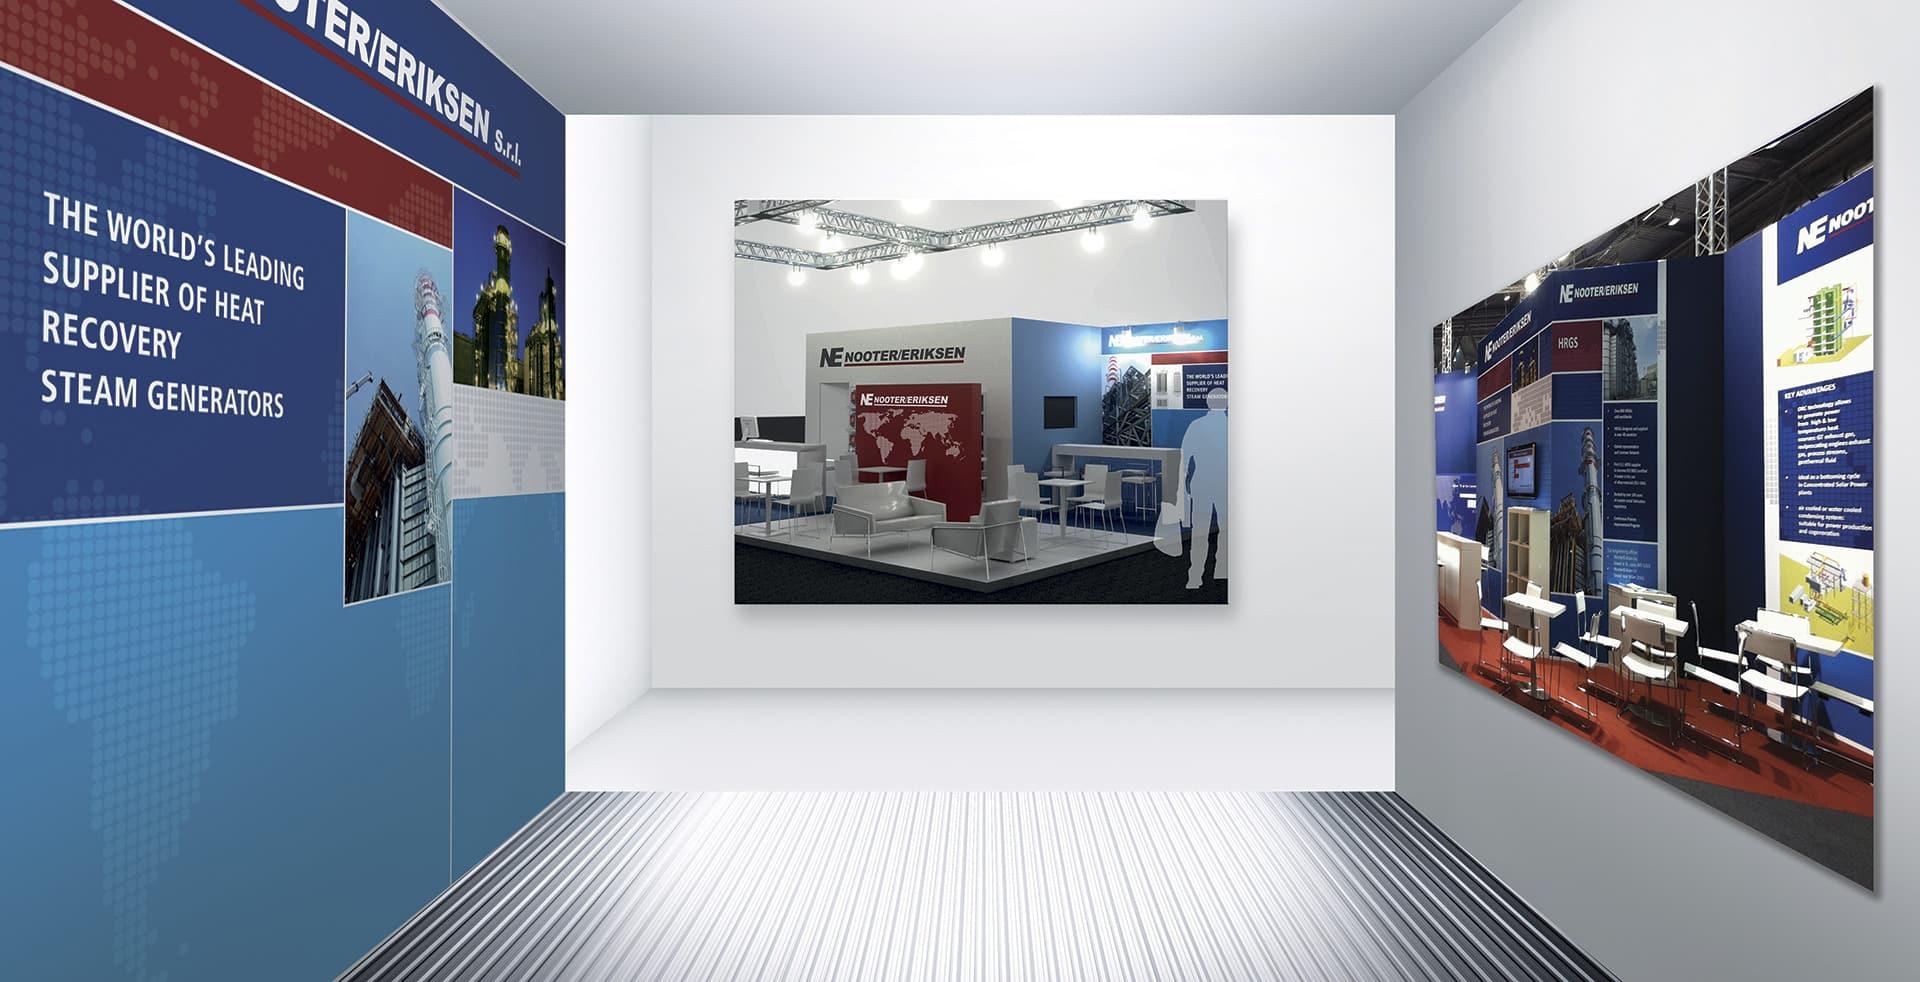 https://www.studiochiesa.it/wp-content/uploads/2020/07/SC-Studio-Chiesa-Communication_Energia-Ambiente-Nooter-Eriksen-exhibitions.jpg